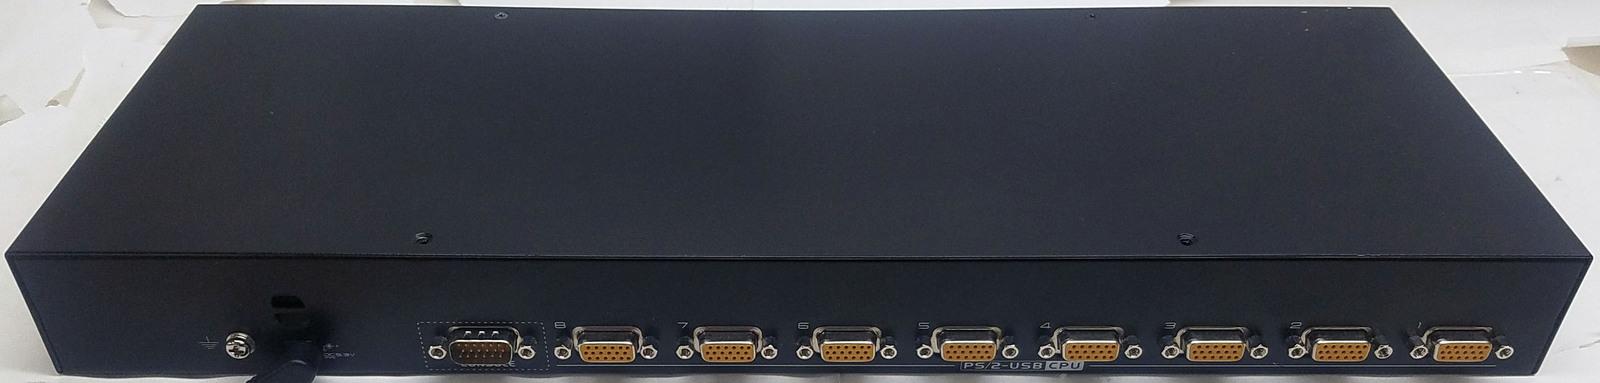 ATENMaster View Max PS2/USB Combo KVM Switch CS1308 Bin:13